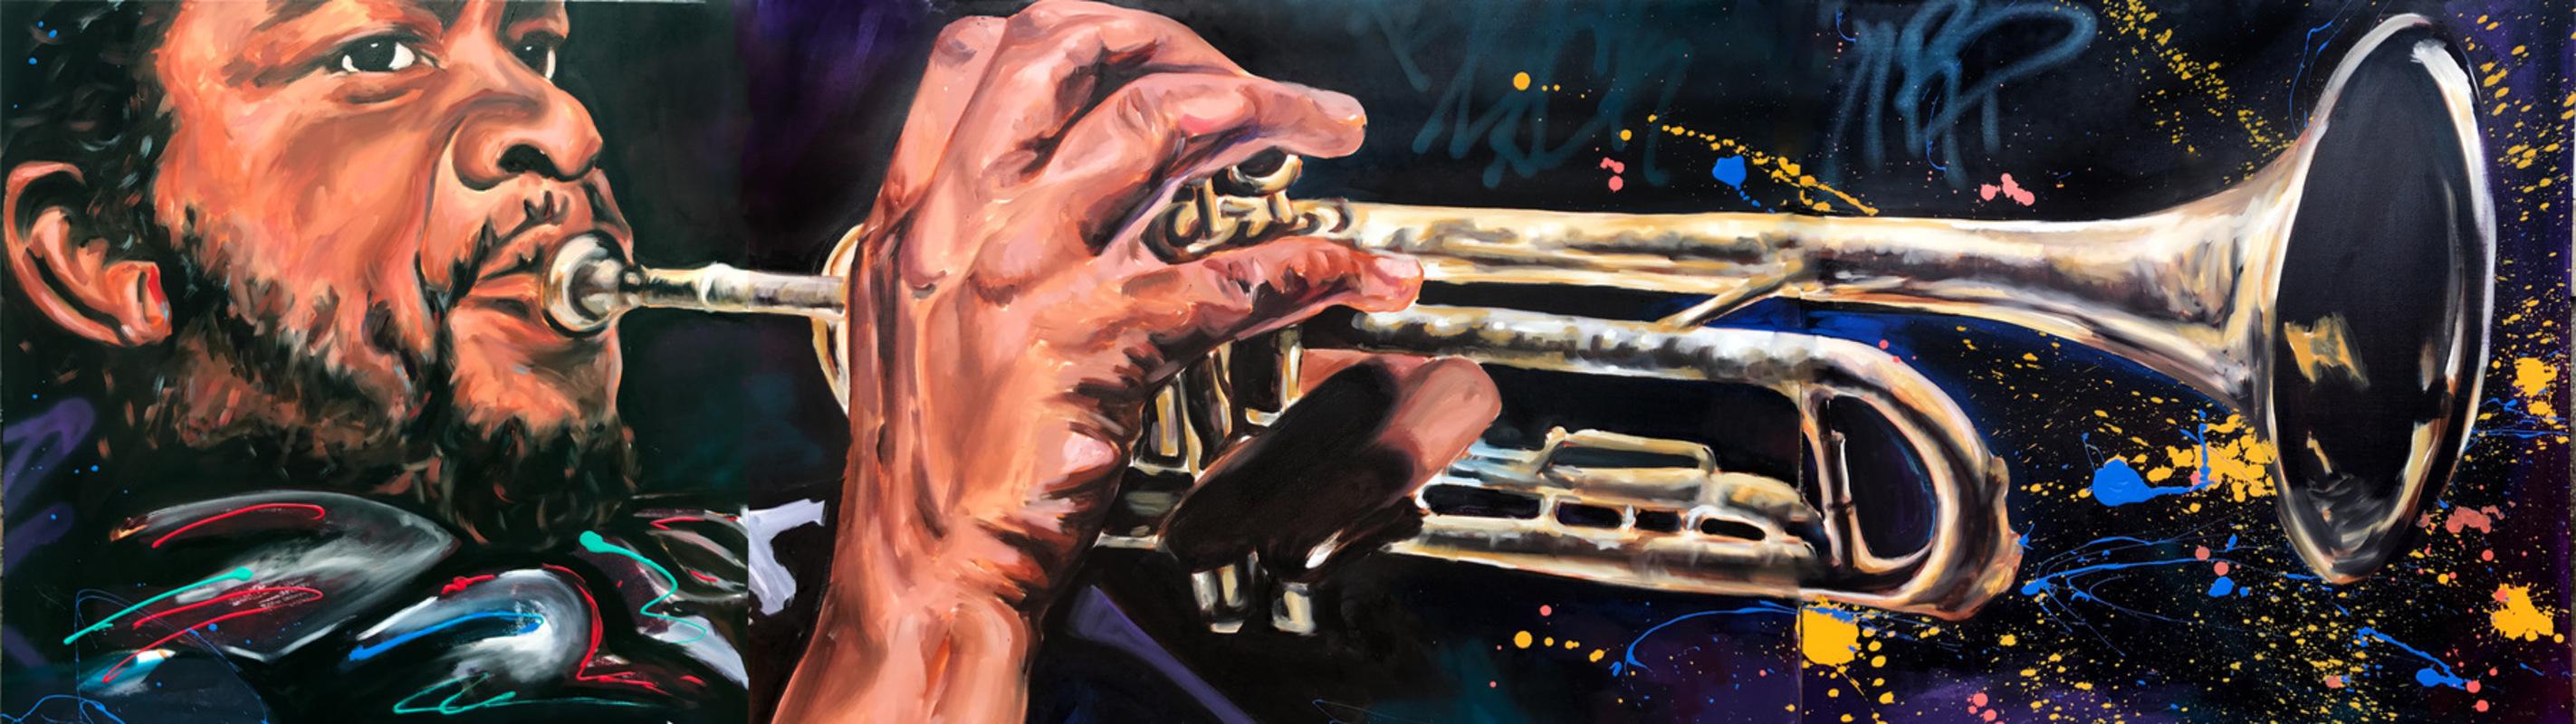 Desiree Kelly Art - Detroit based artist - Donald Byrd